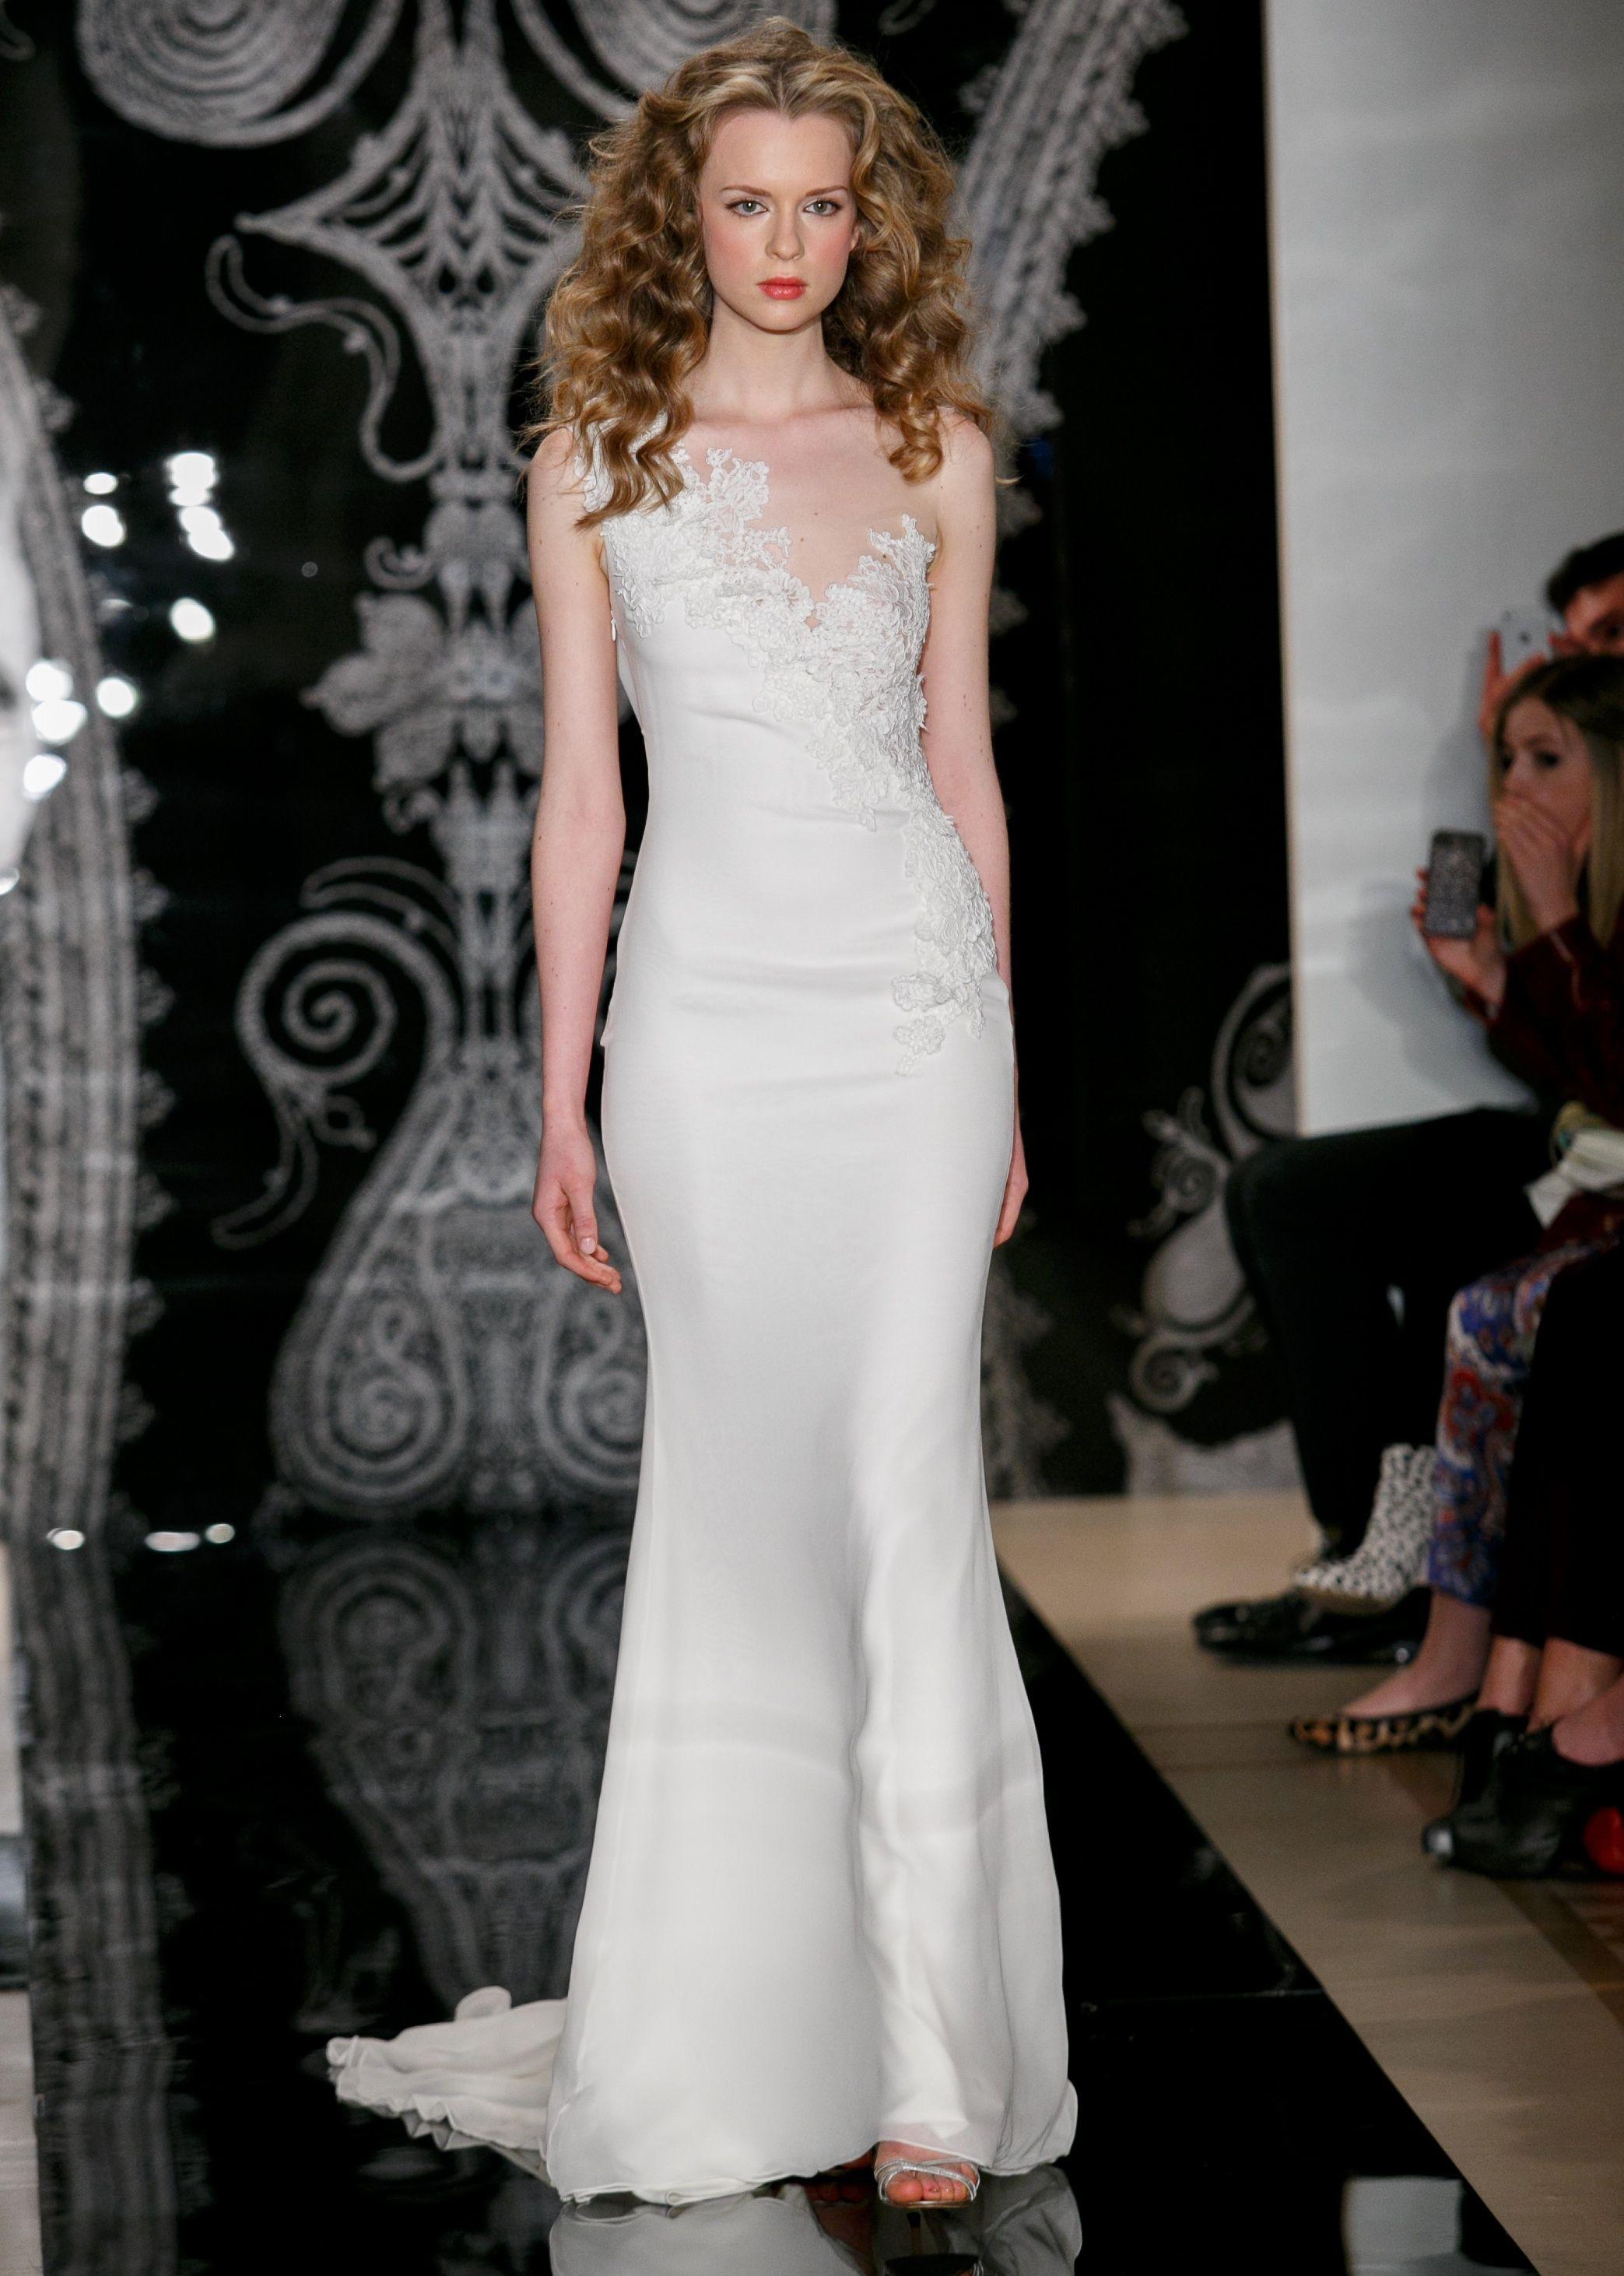 Wedding dress designers reem acra The best wedding photo blog